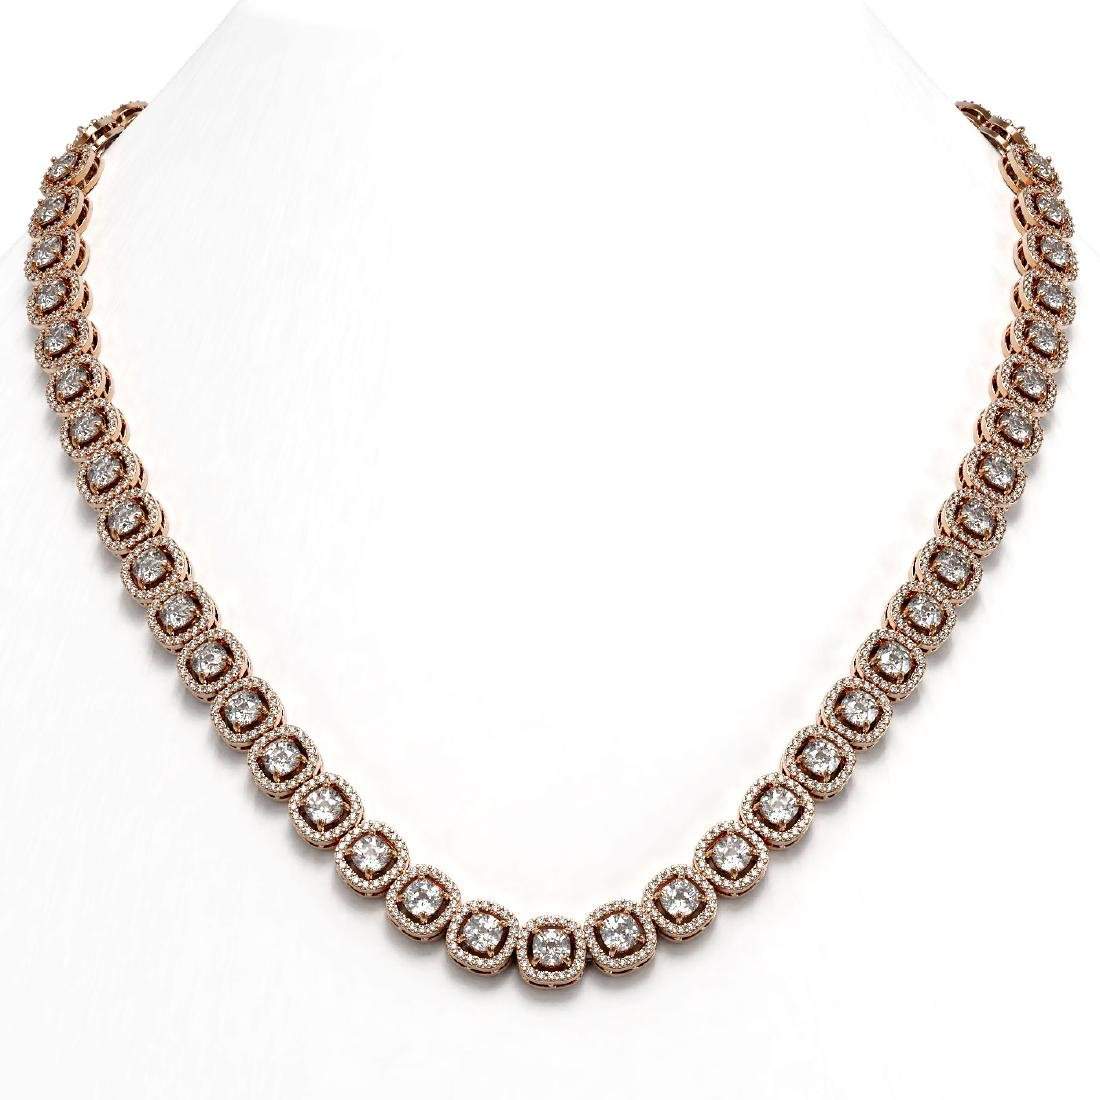 24.4 ctw Cushion Diamond Designer Necklace 18K Rose